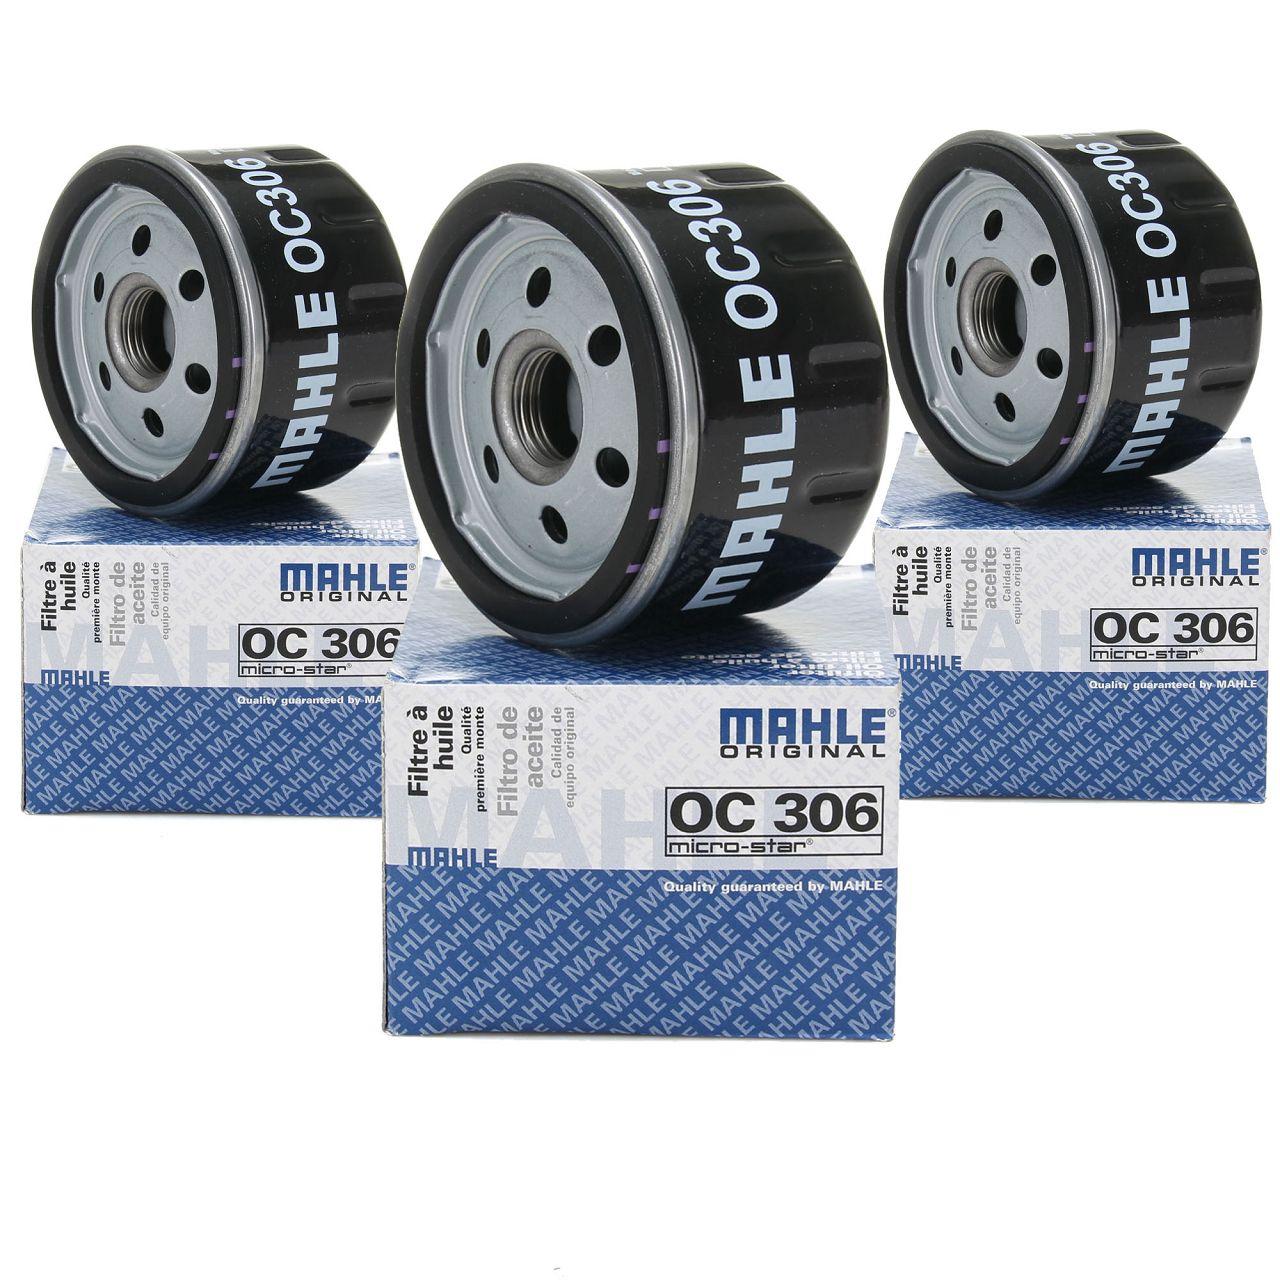 3x KNECHT / MAHLE OC306 Ölfilter Motorölfilter für BMW i3 (I01) 102/170/184 PS